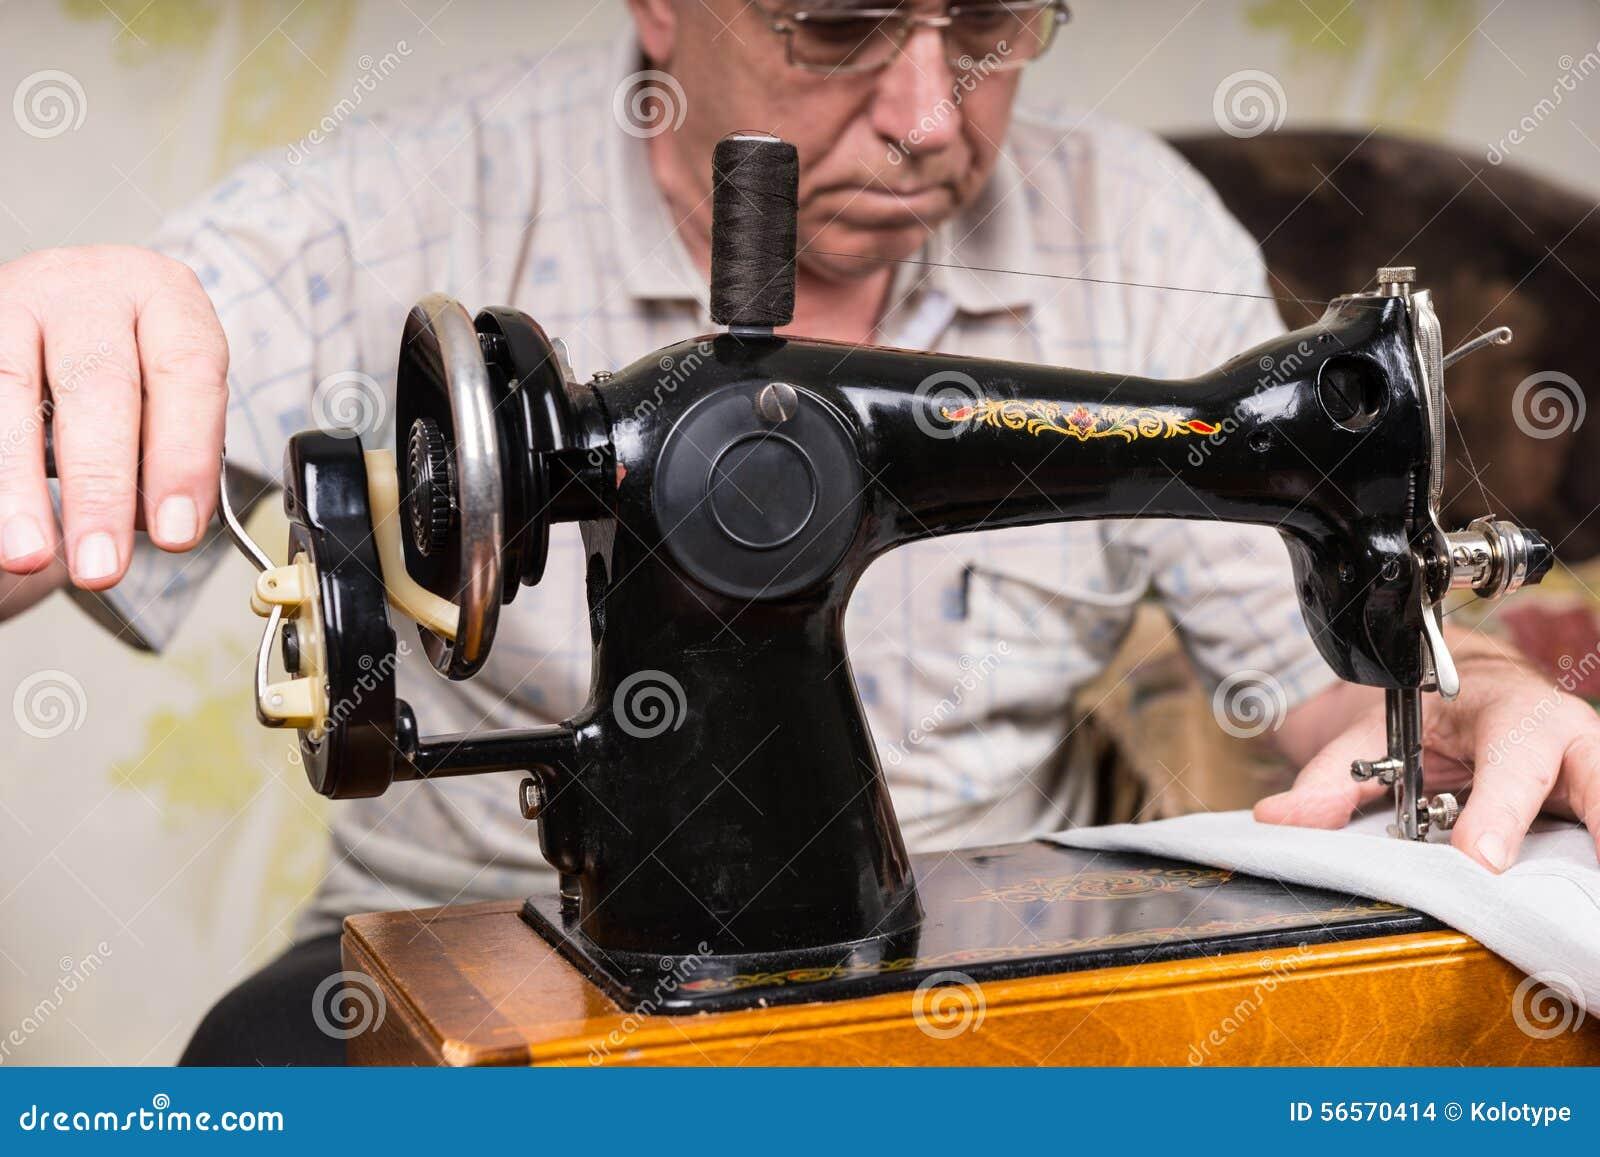 Download Ανώτερο άτομο που χρησιμοποιεί την ντεμοντέ ράβοντας μηχανή Στοκ Εικόνες - εικόνα από ραπτική, armlet: 56570414